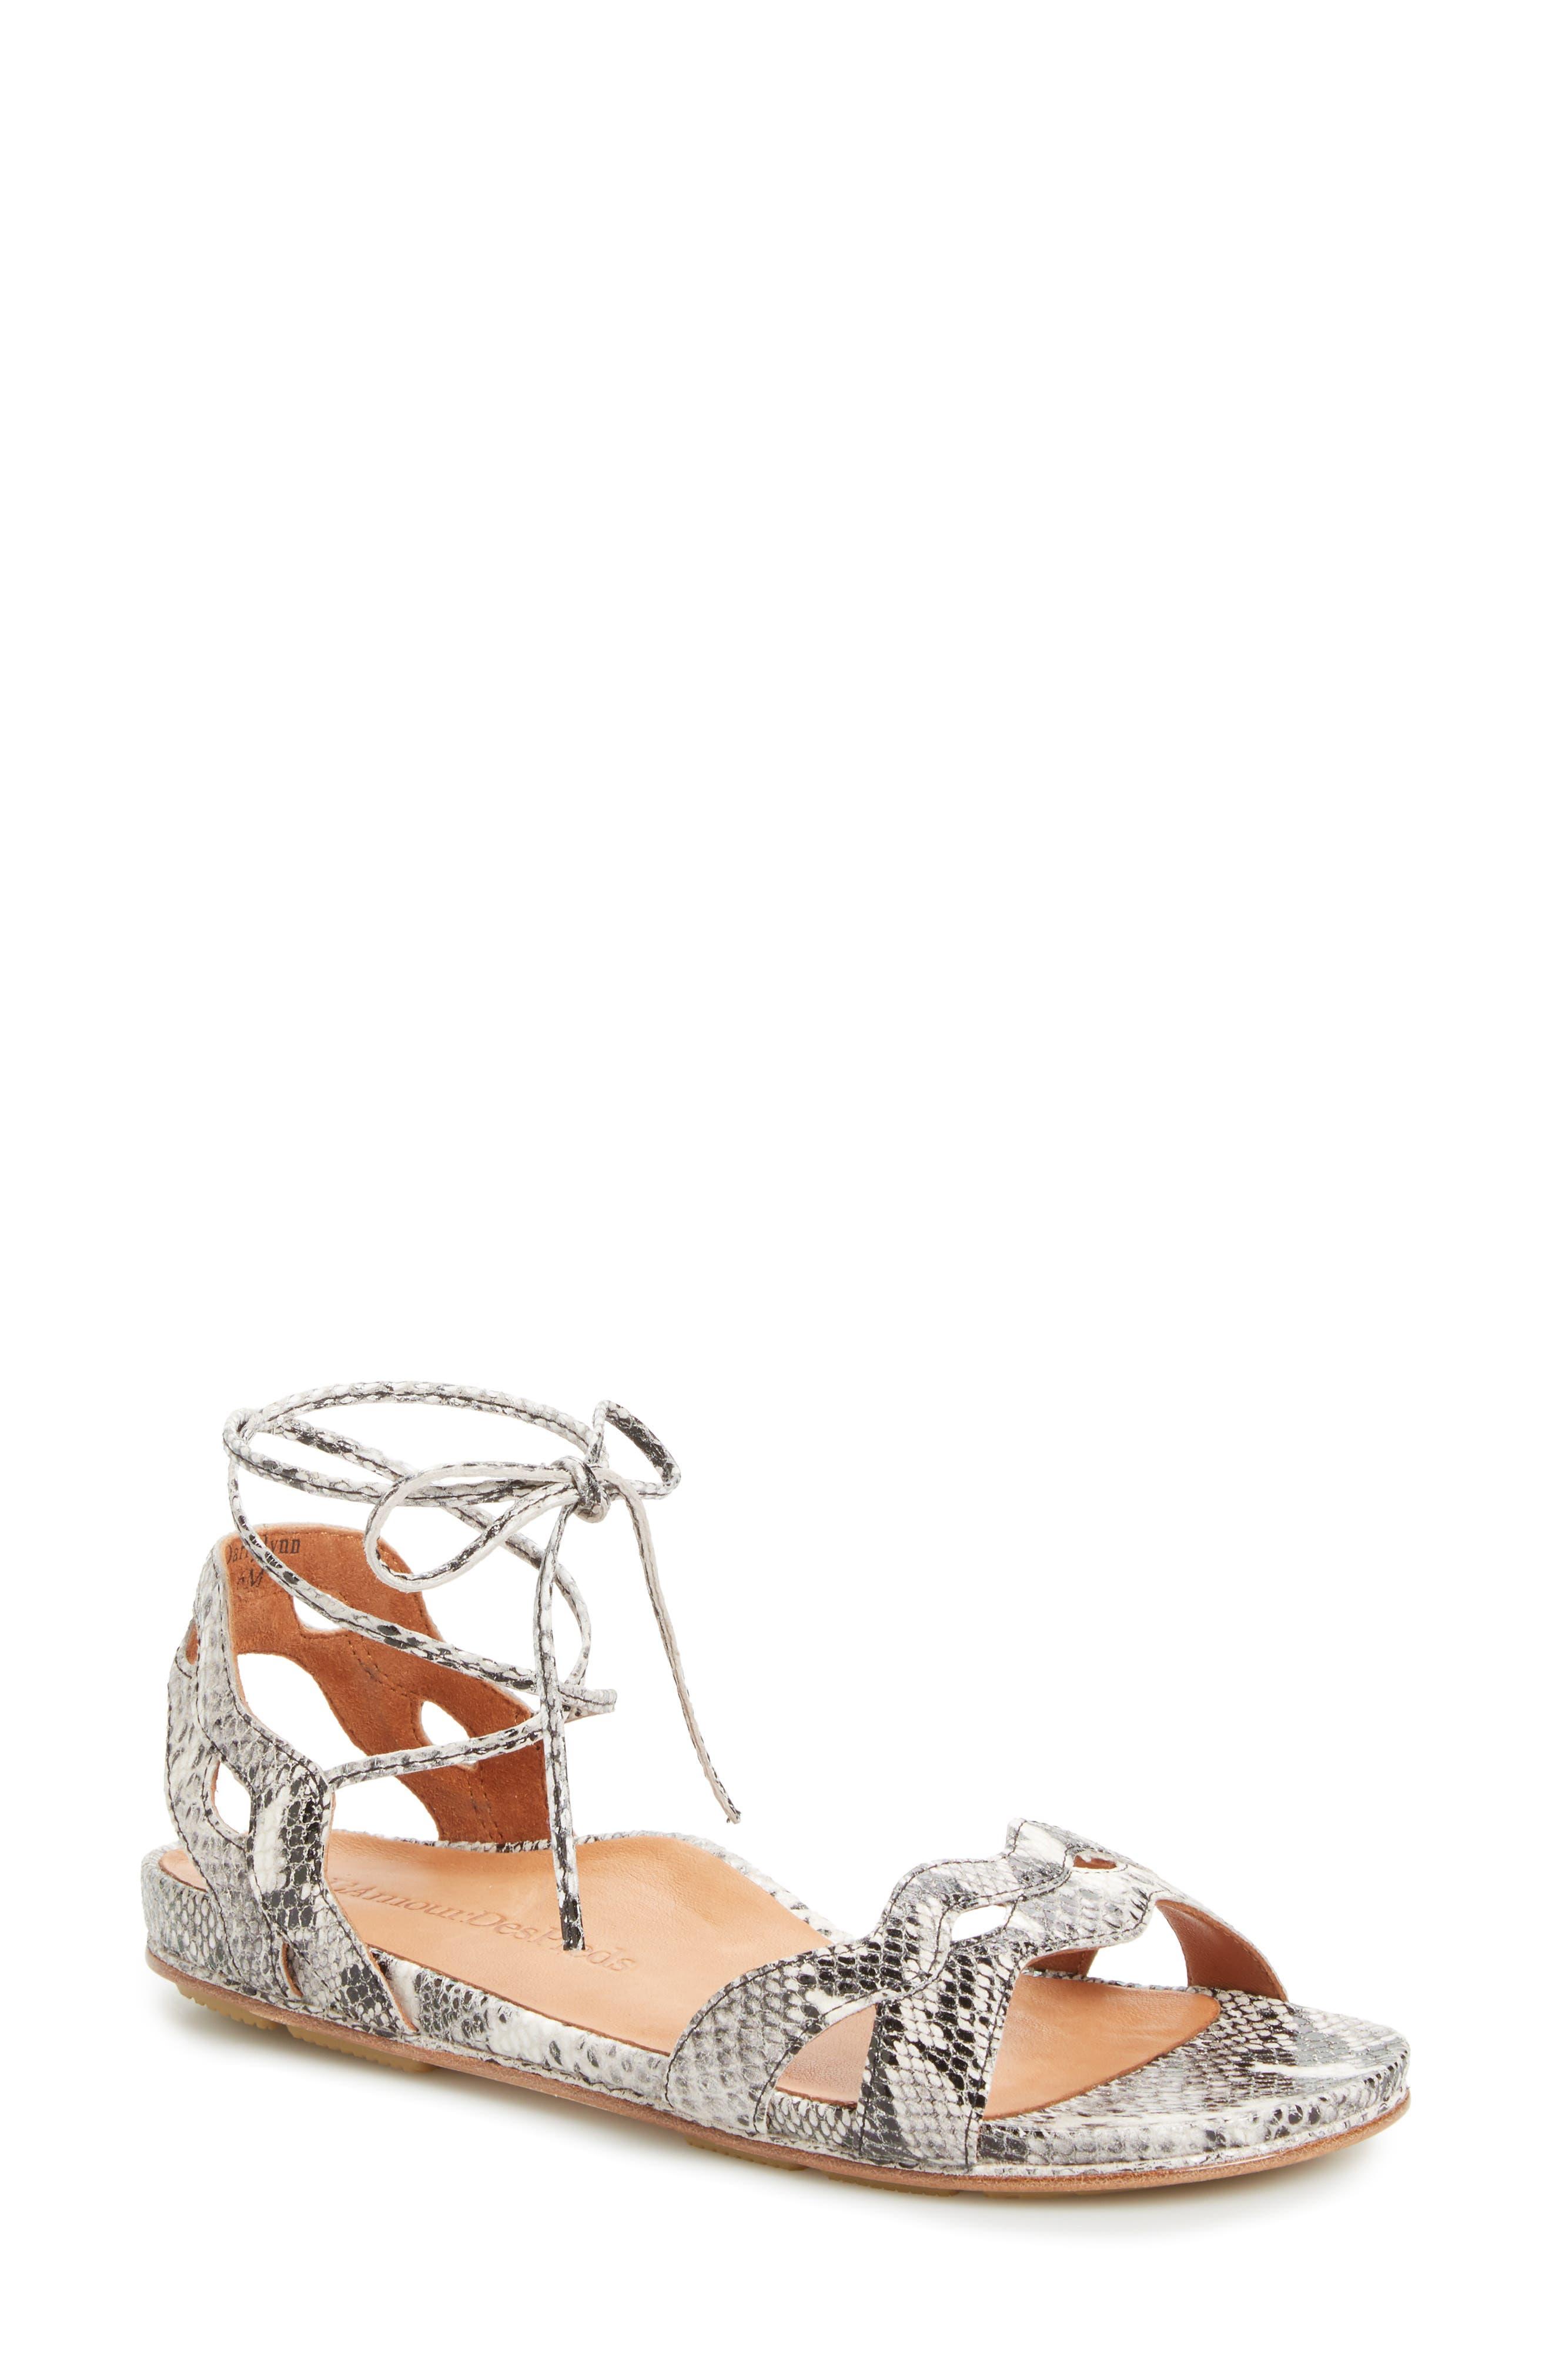 Darrylynn Wraparound Lace-Up Sandal,                         Main,                         color, 002